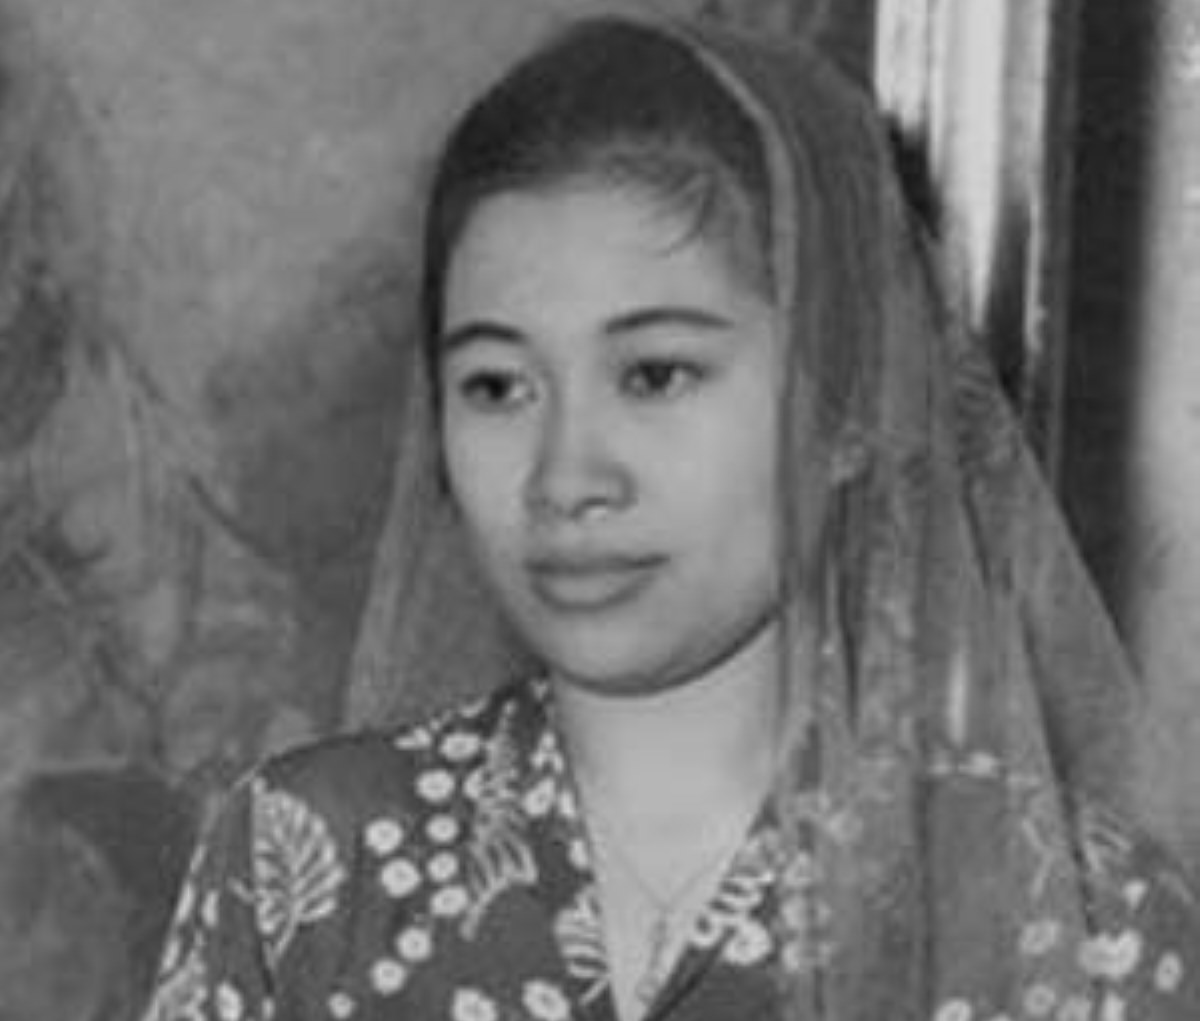 Pahlawan Wanita Indonesia Fatmawati Soekarno